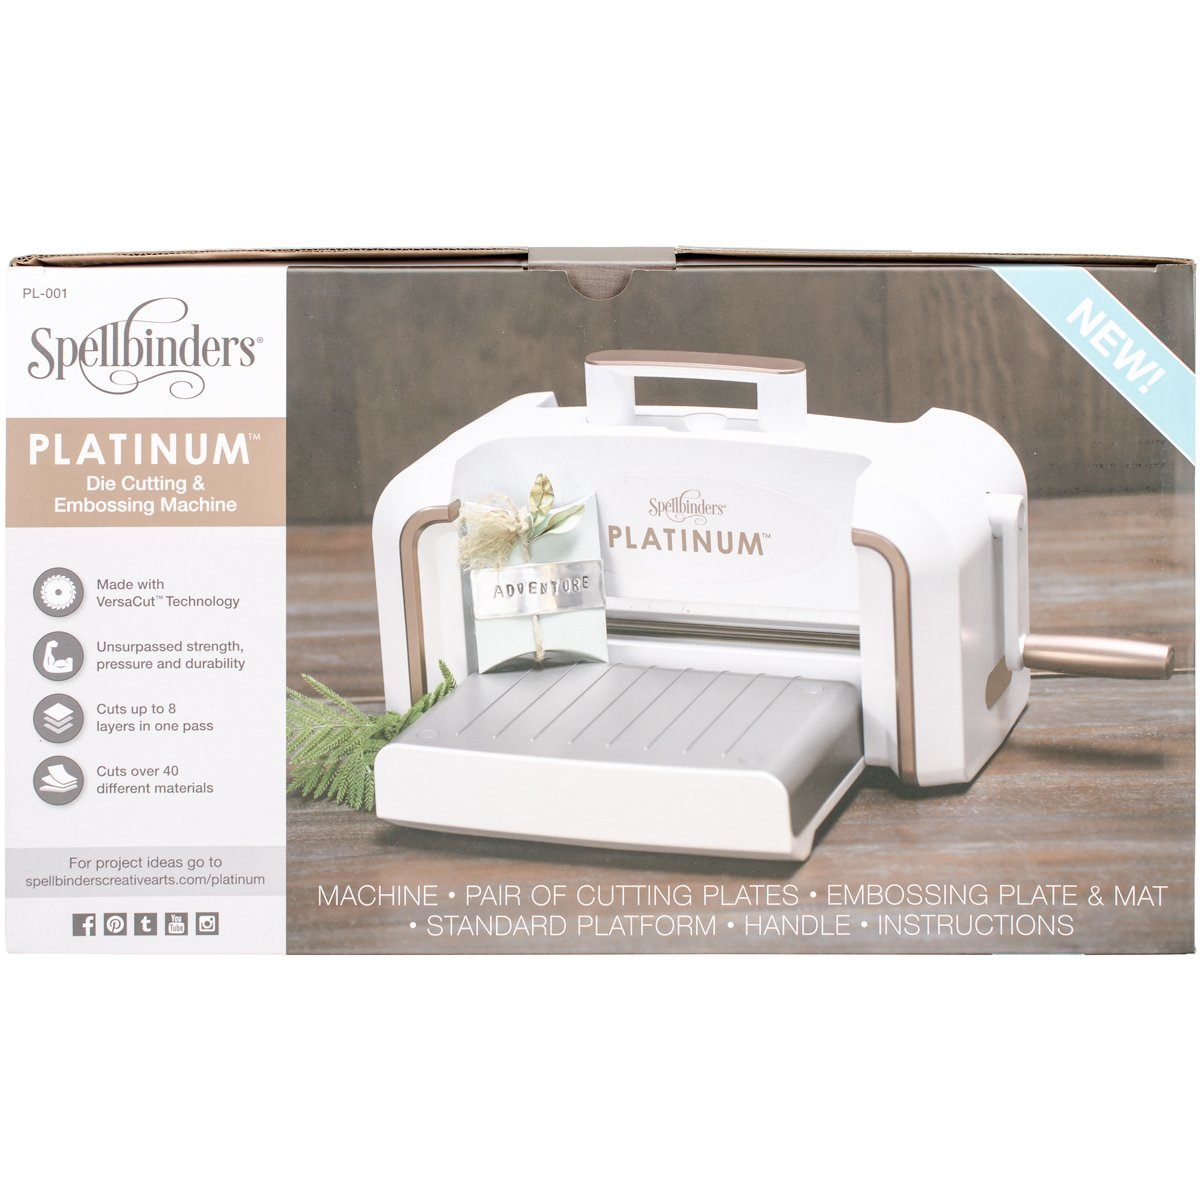 Spellbinders PL-001 Platinum Cut & Emboss Machine, White